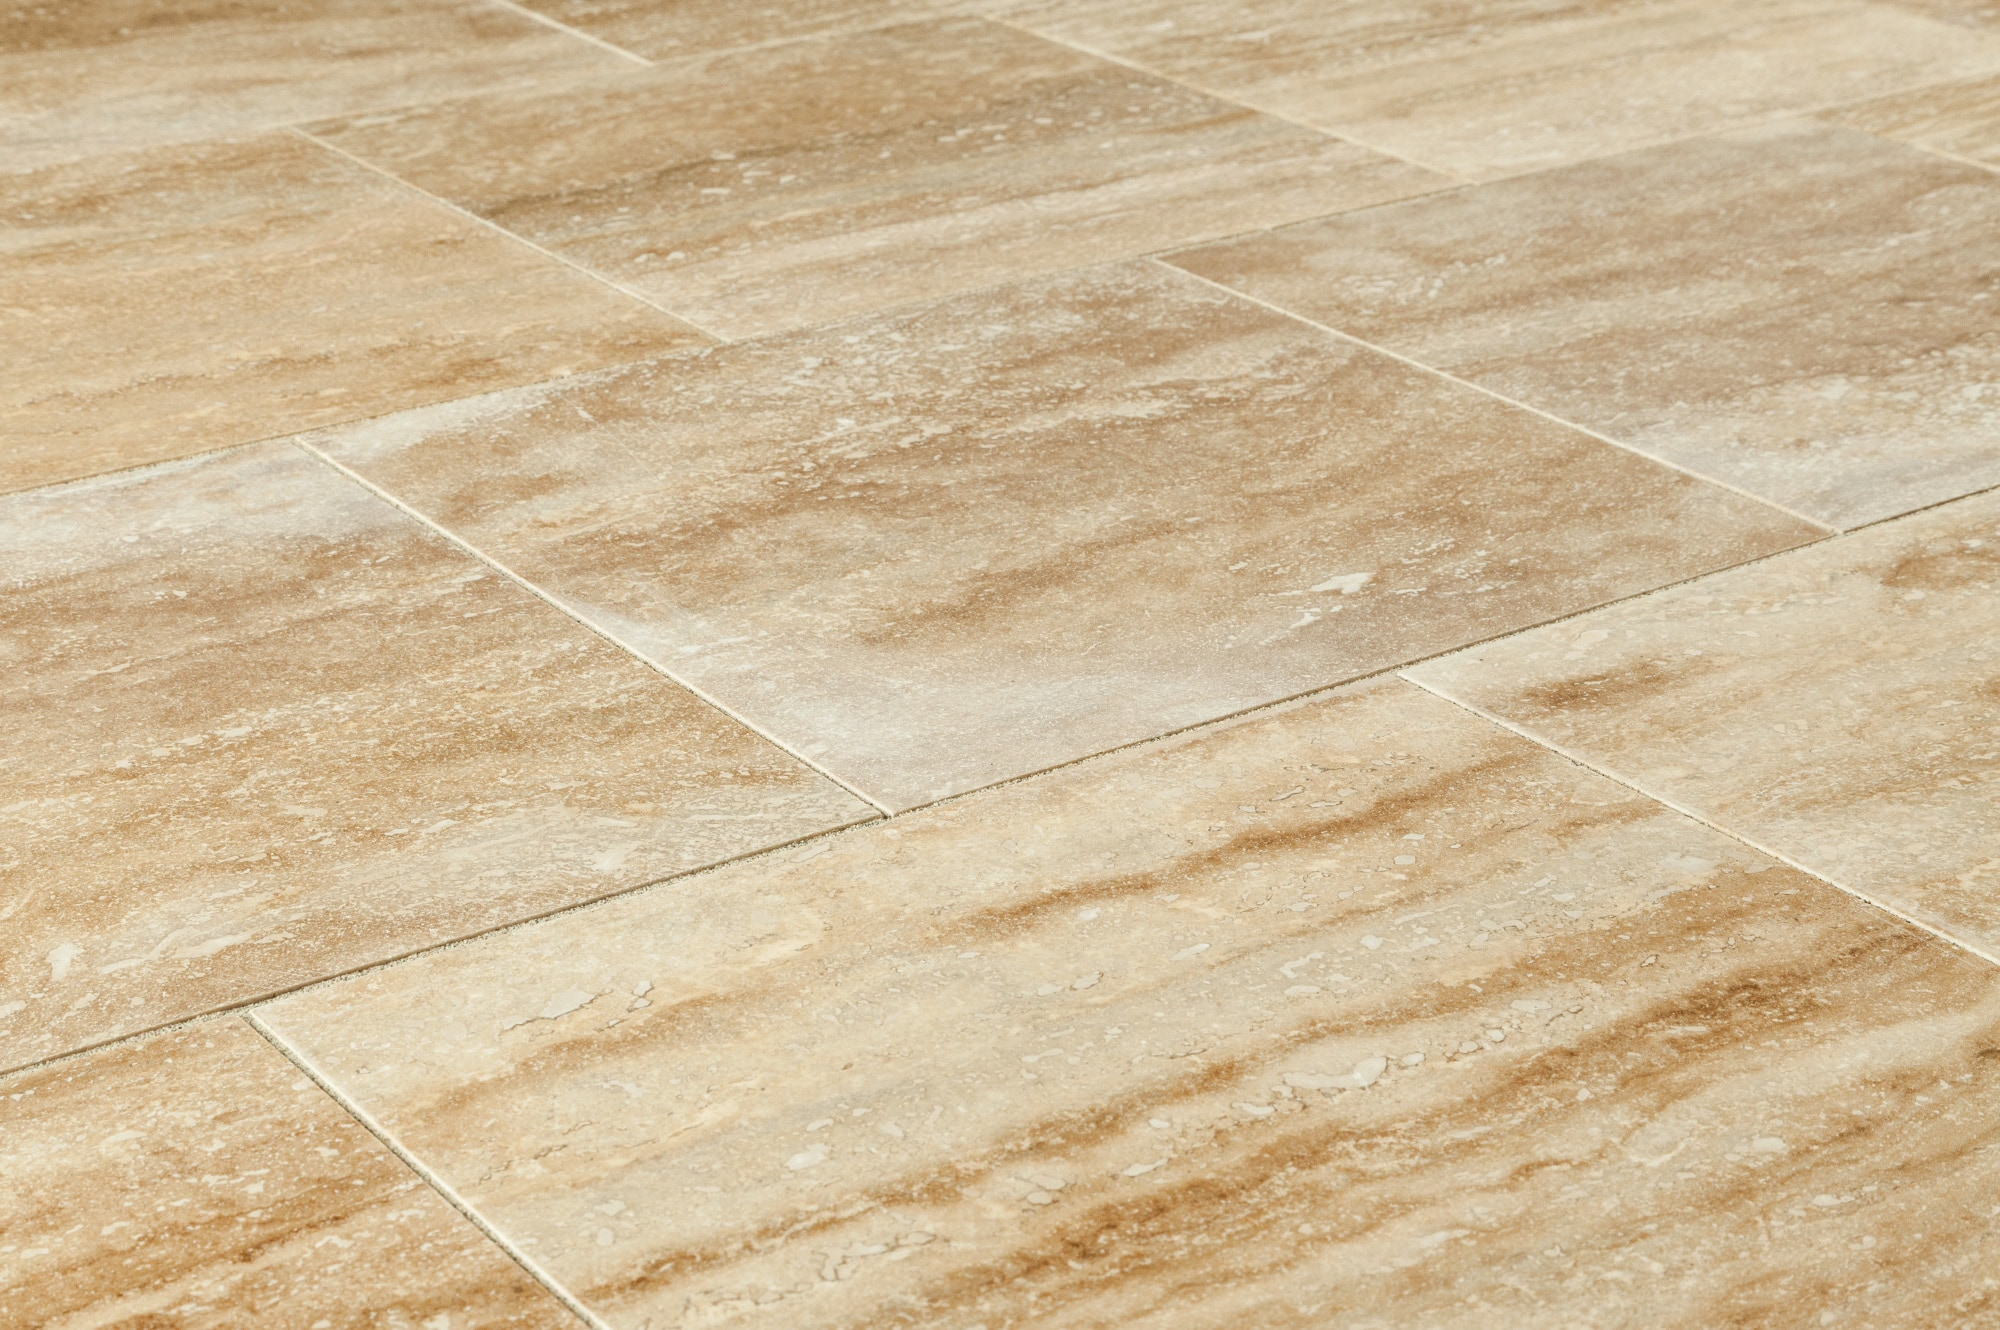 Izmir travertine tile polished walnut vein cut 12x12 polished dailygadgetfo Image collections